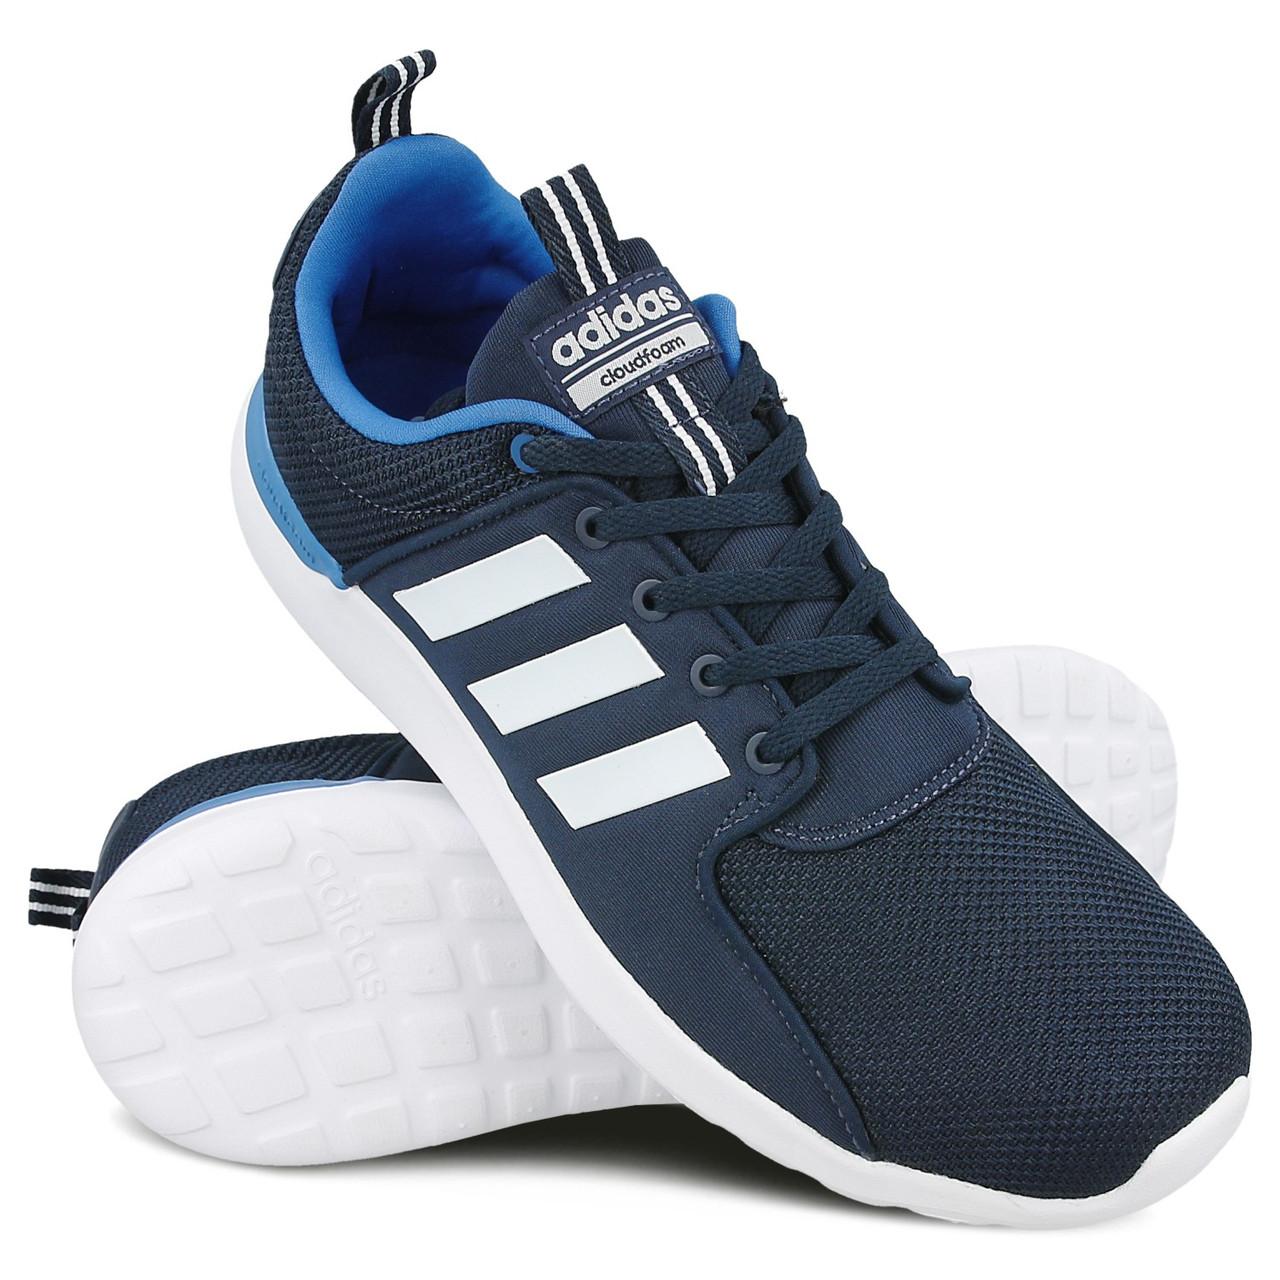 c20c2871cec734 Кросівки чоловічі Adidas CF Lite Racer Shoes: продажа, цена в ...